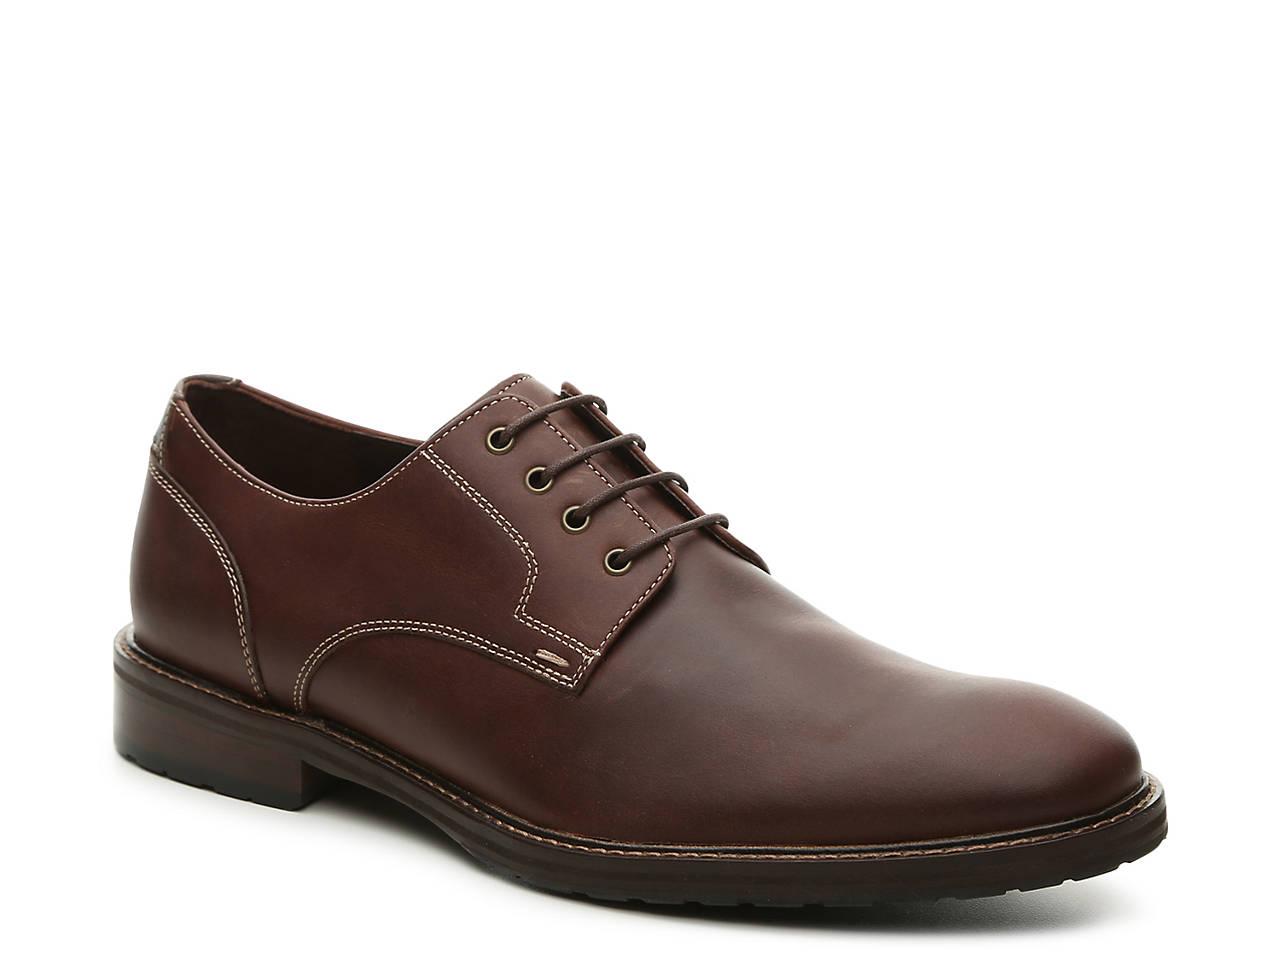 7c9aa4d996e J. Murphy by Johnston   Murphy Wiley Oxford Men s Shoes